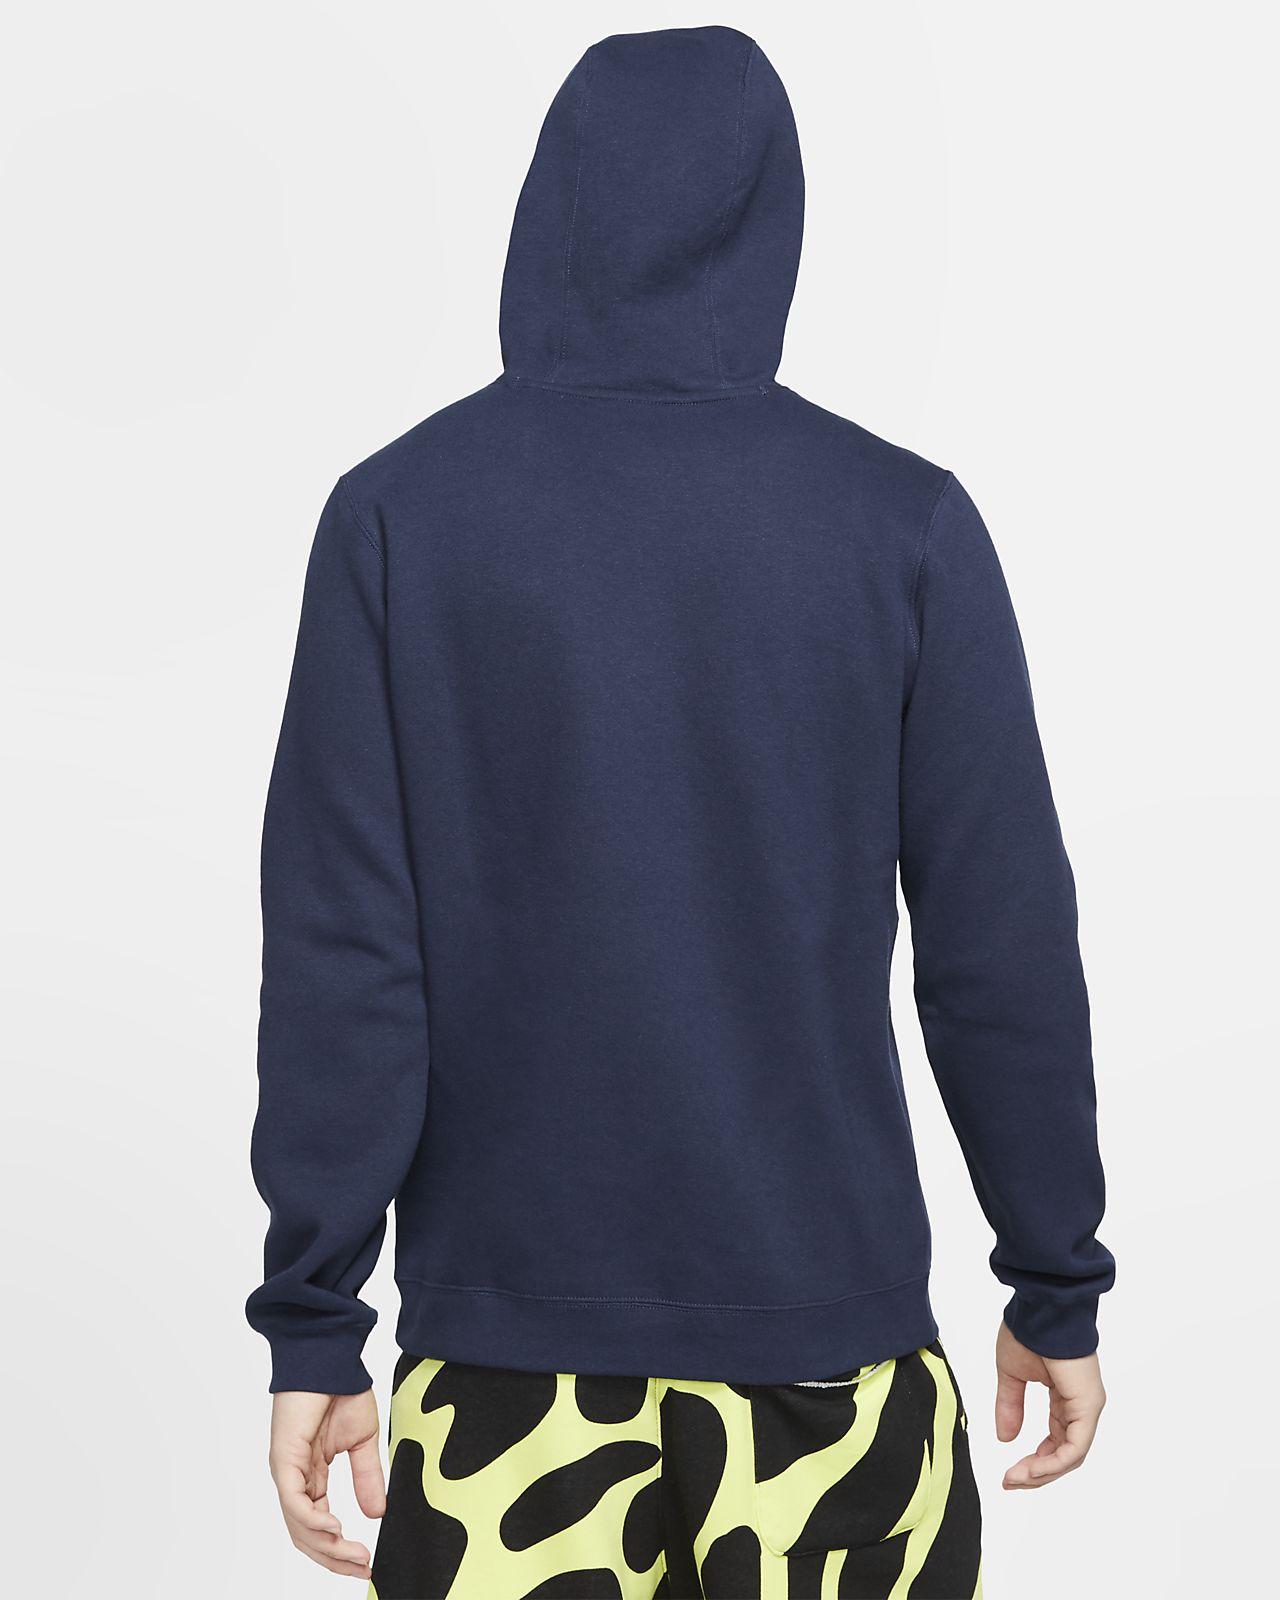 db3840a6d87 Low Resolution Nike Sportswear Pullover Hoodie Nike Sportswear Pullover  Hoodie